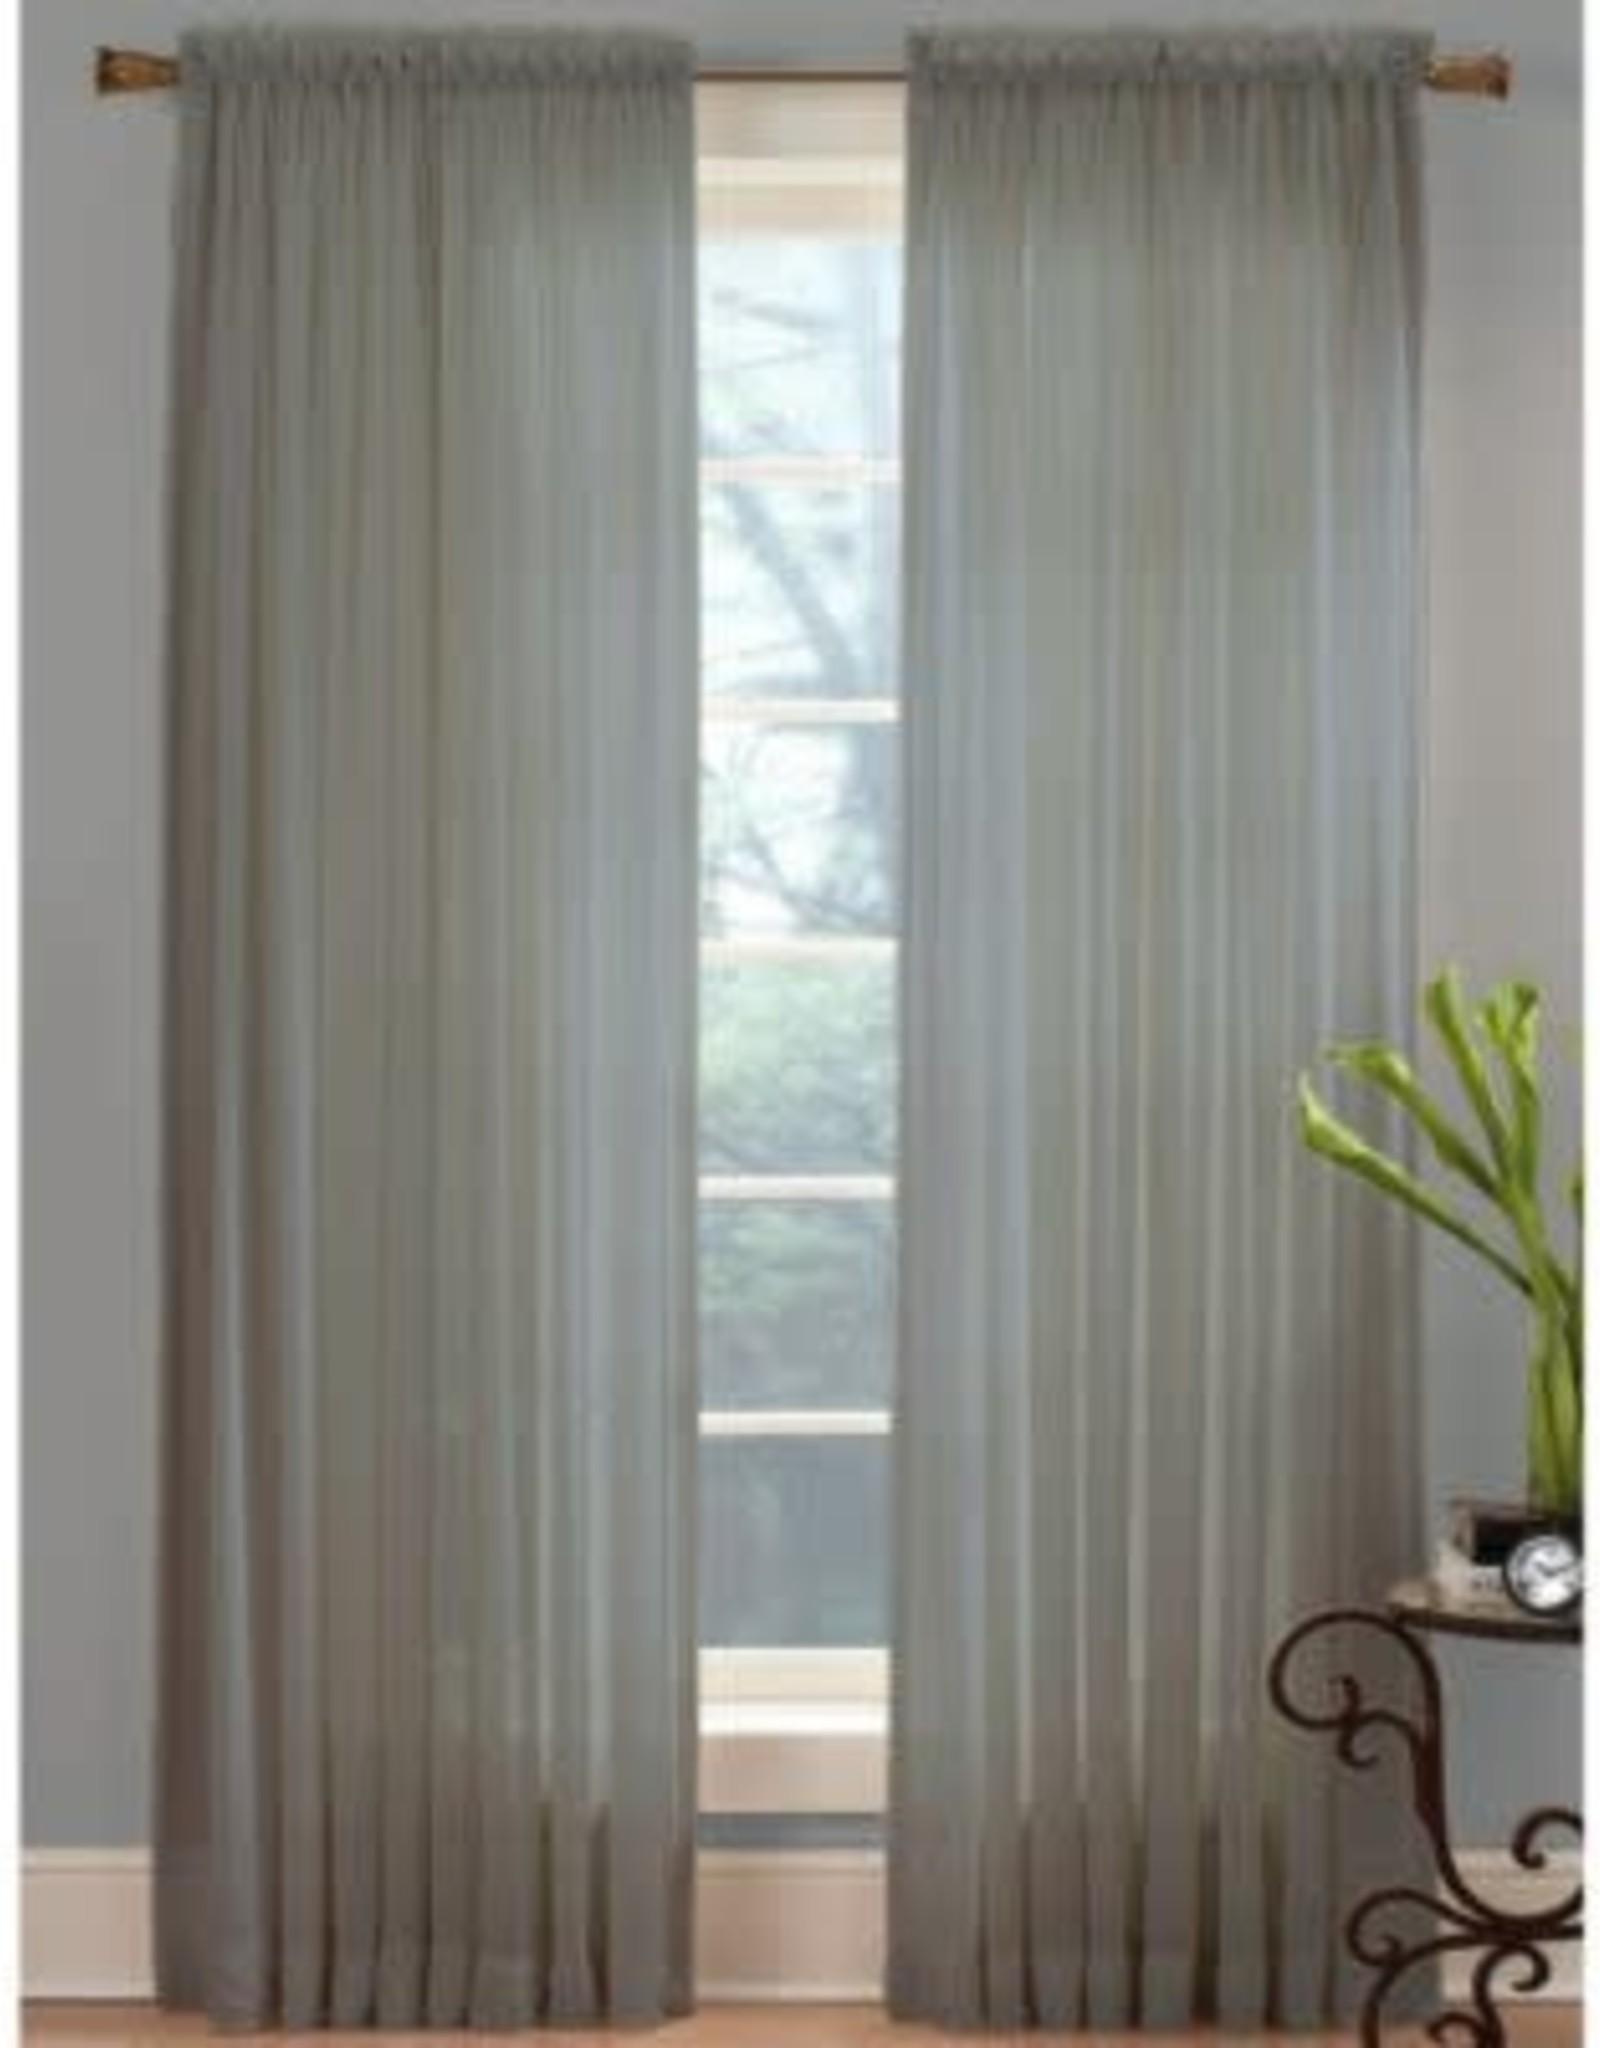 "Miller Curtains VOILE 63""L RPP COAL PANEL"